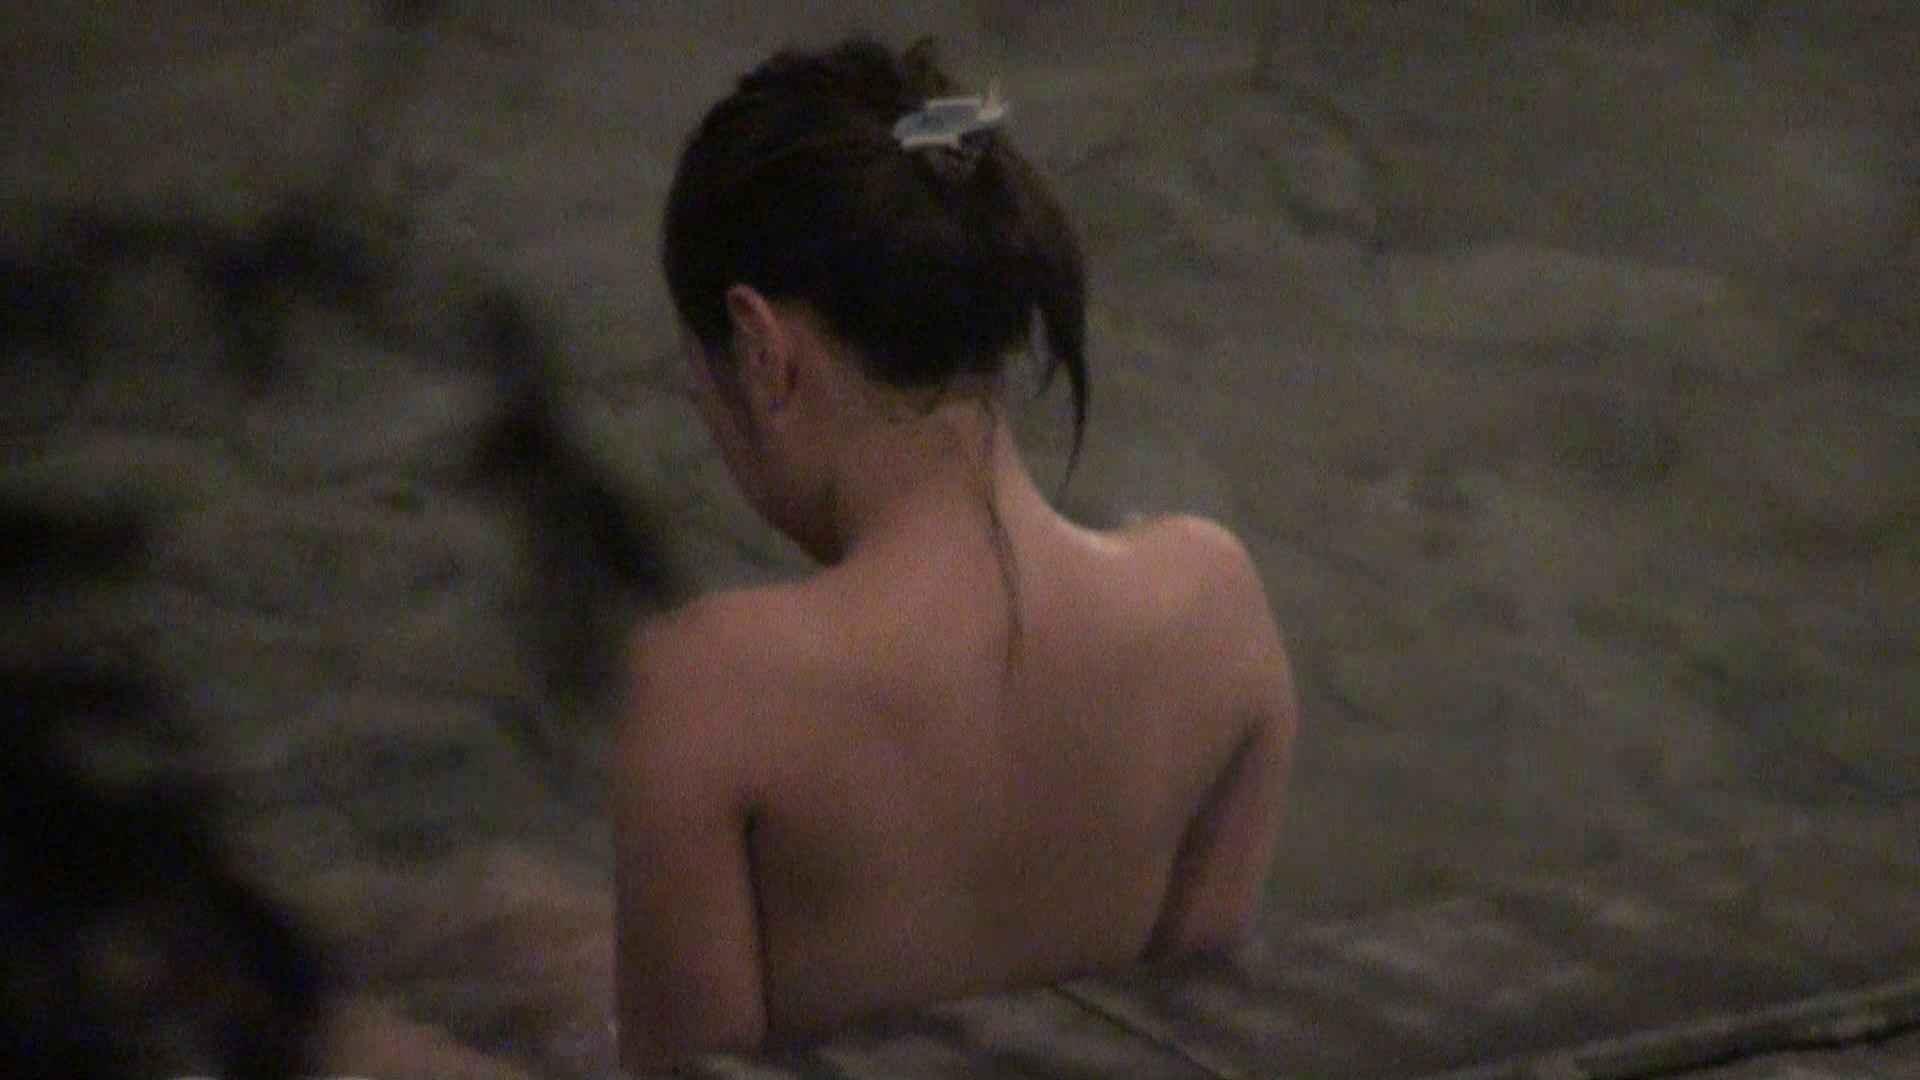 Aquaな露天風呂Vol.407 0  67連発 65